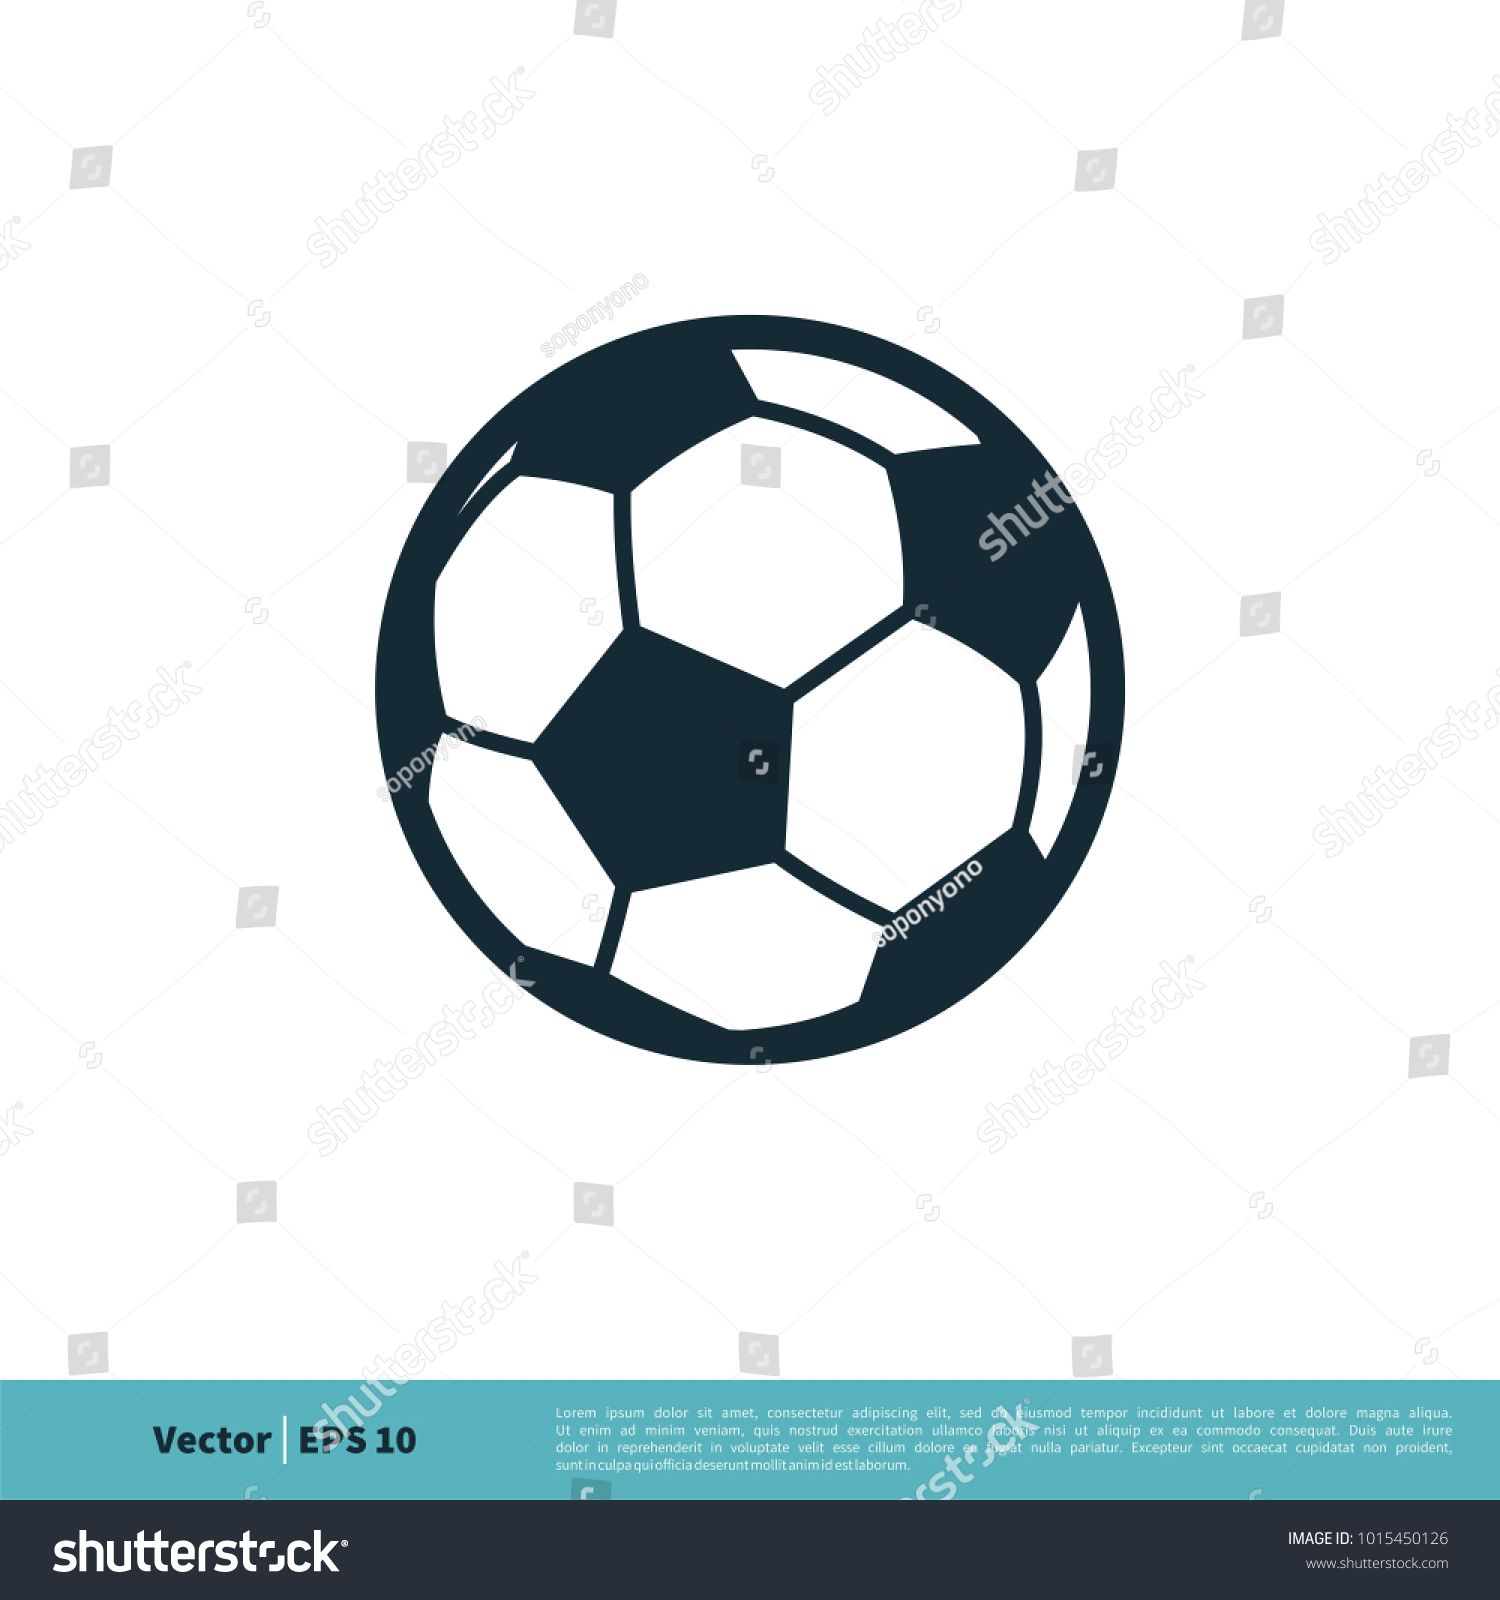 Svg File Soccer Team Logo Vector Soccer Balls Svg Dxf Png Eps Soccer Ball Flame Wings Laurel Wreath Clipart Team Logo Svg Vector Logo Emblem Logo Soccer Balls